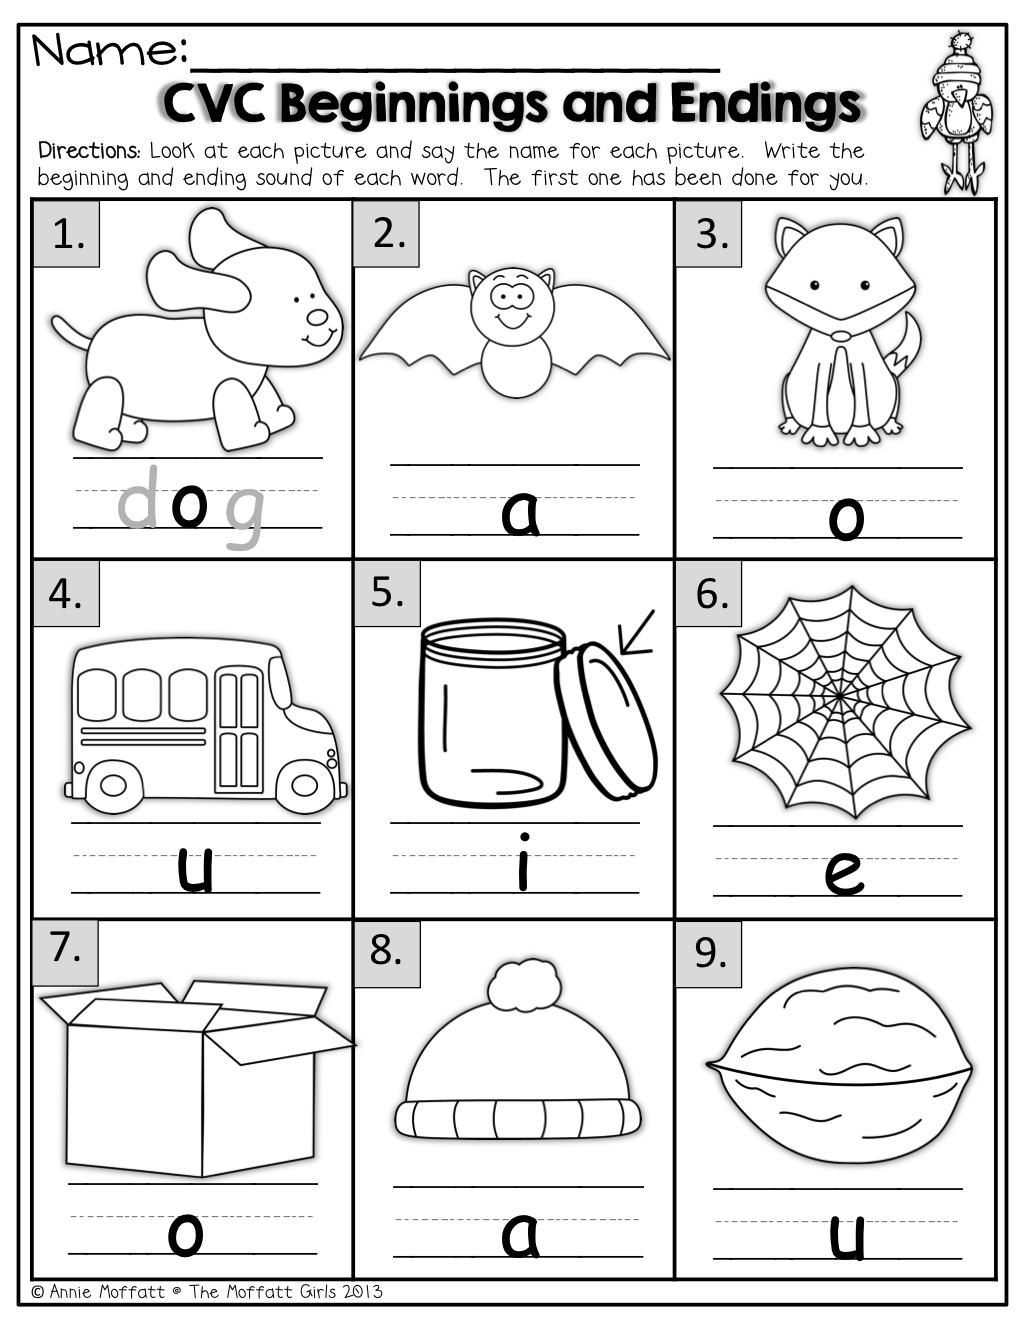 small resolution of Pin by The Moffatt Girls on KinderLand Collaborative   Kindergarten  language arts